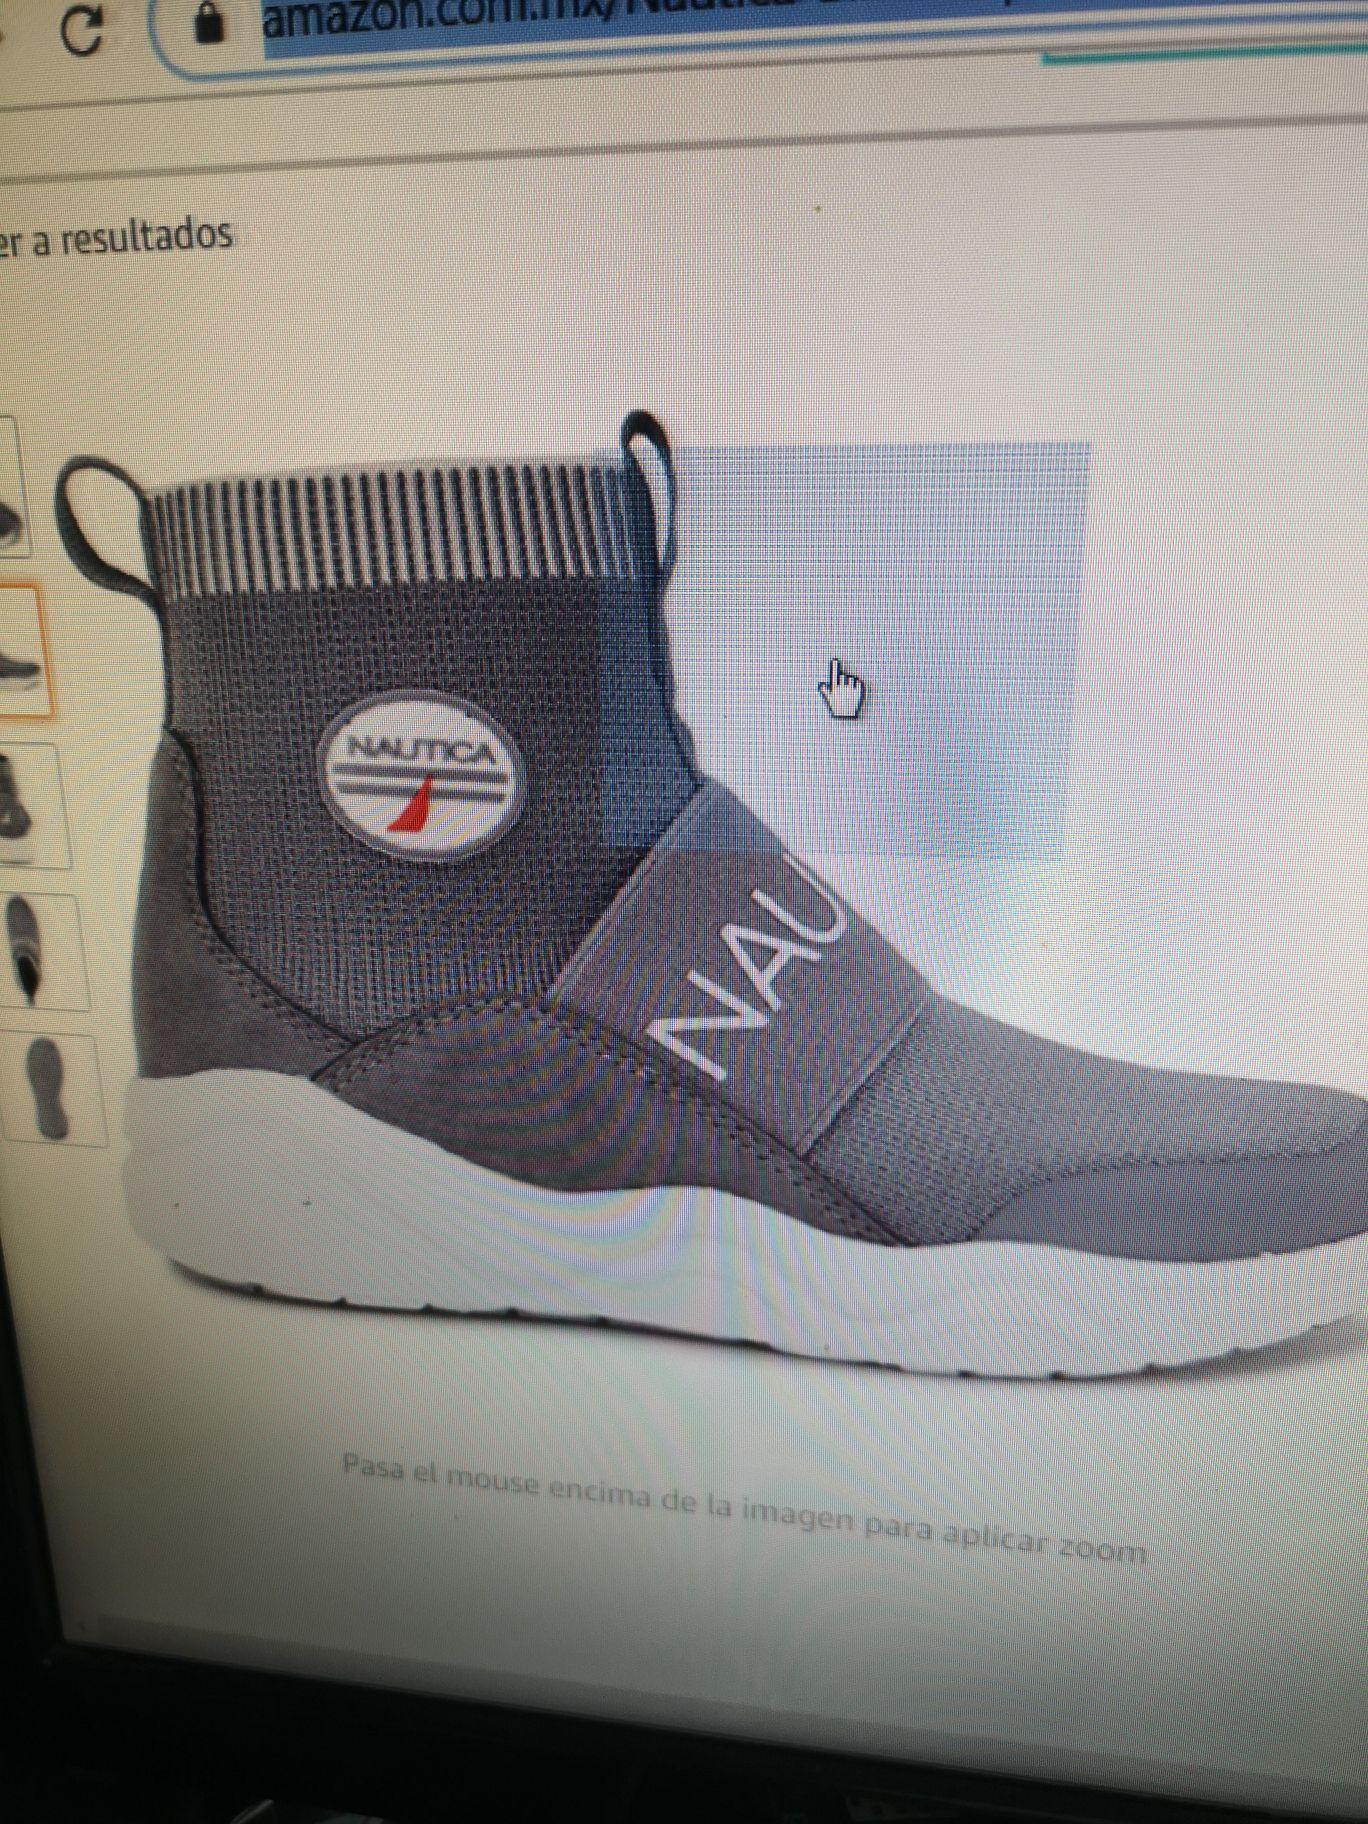 Amazon botines para la BENDI Náutica talla 22cm $358